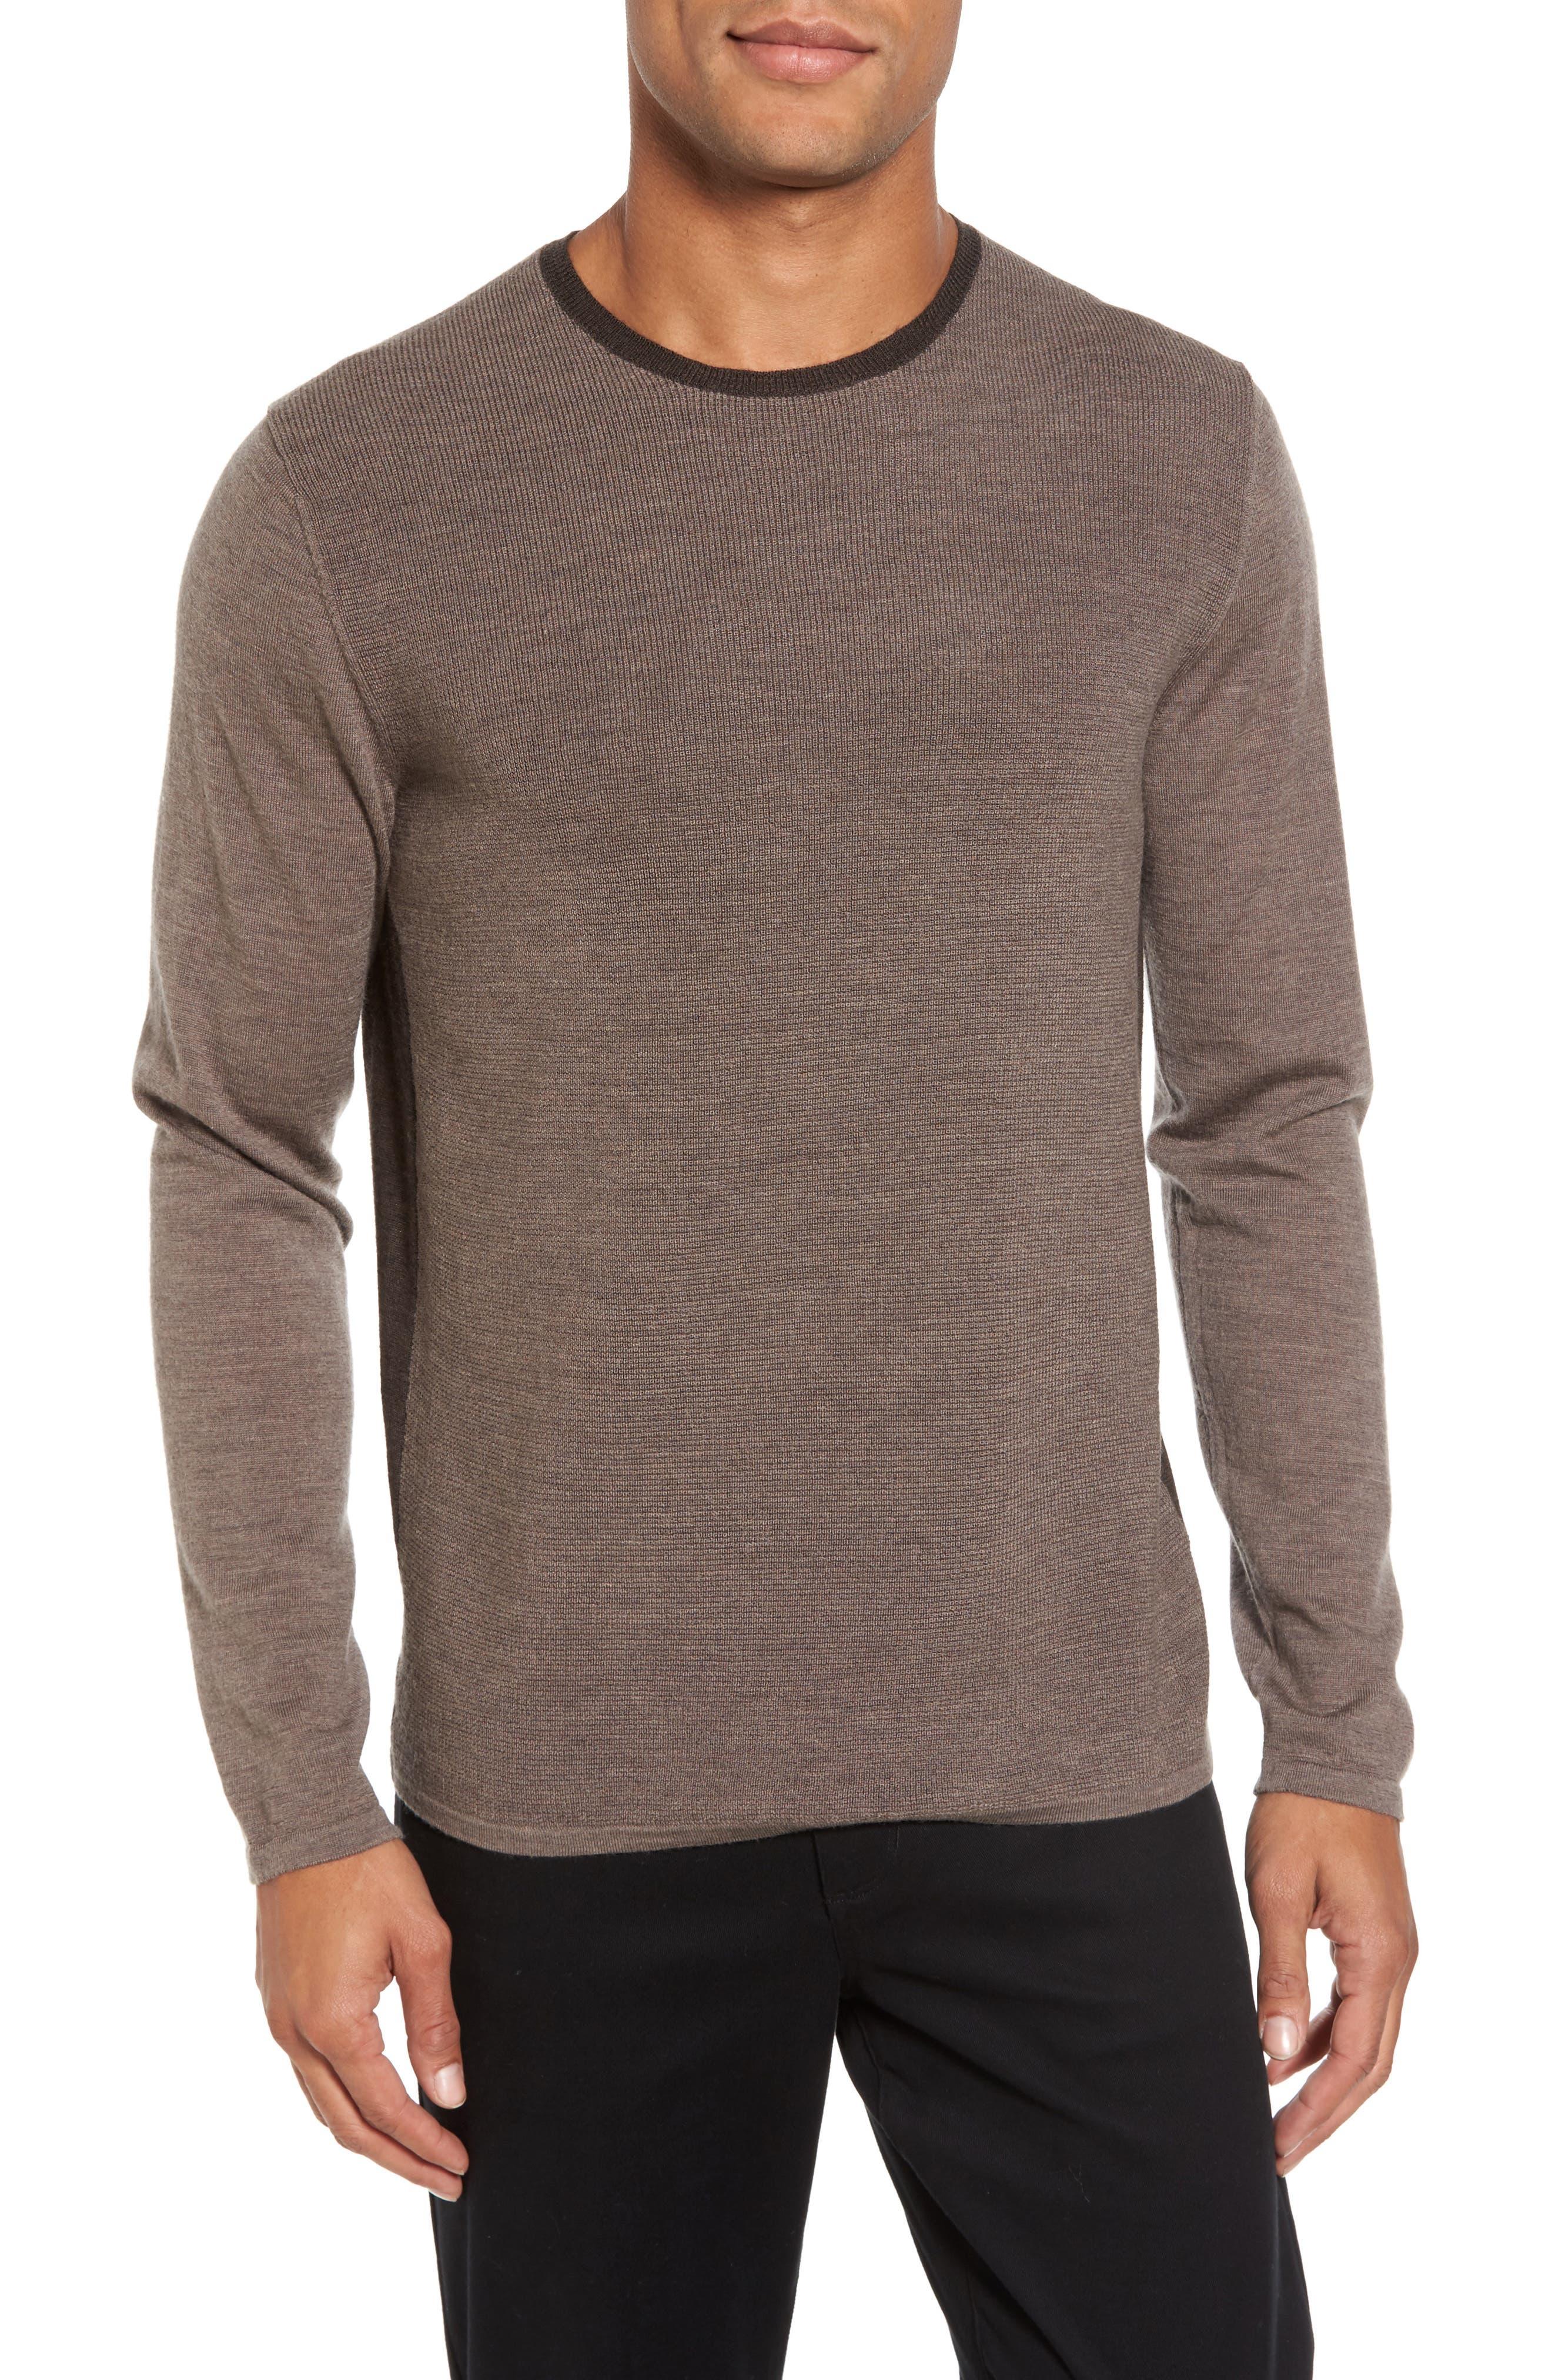 Alternate Image 1 Selected - Zachary Prell Huxley Merino Sweater